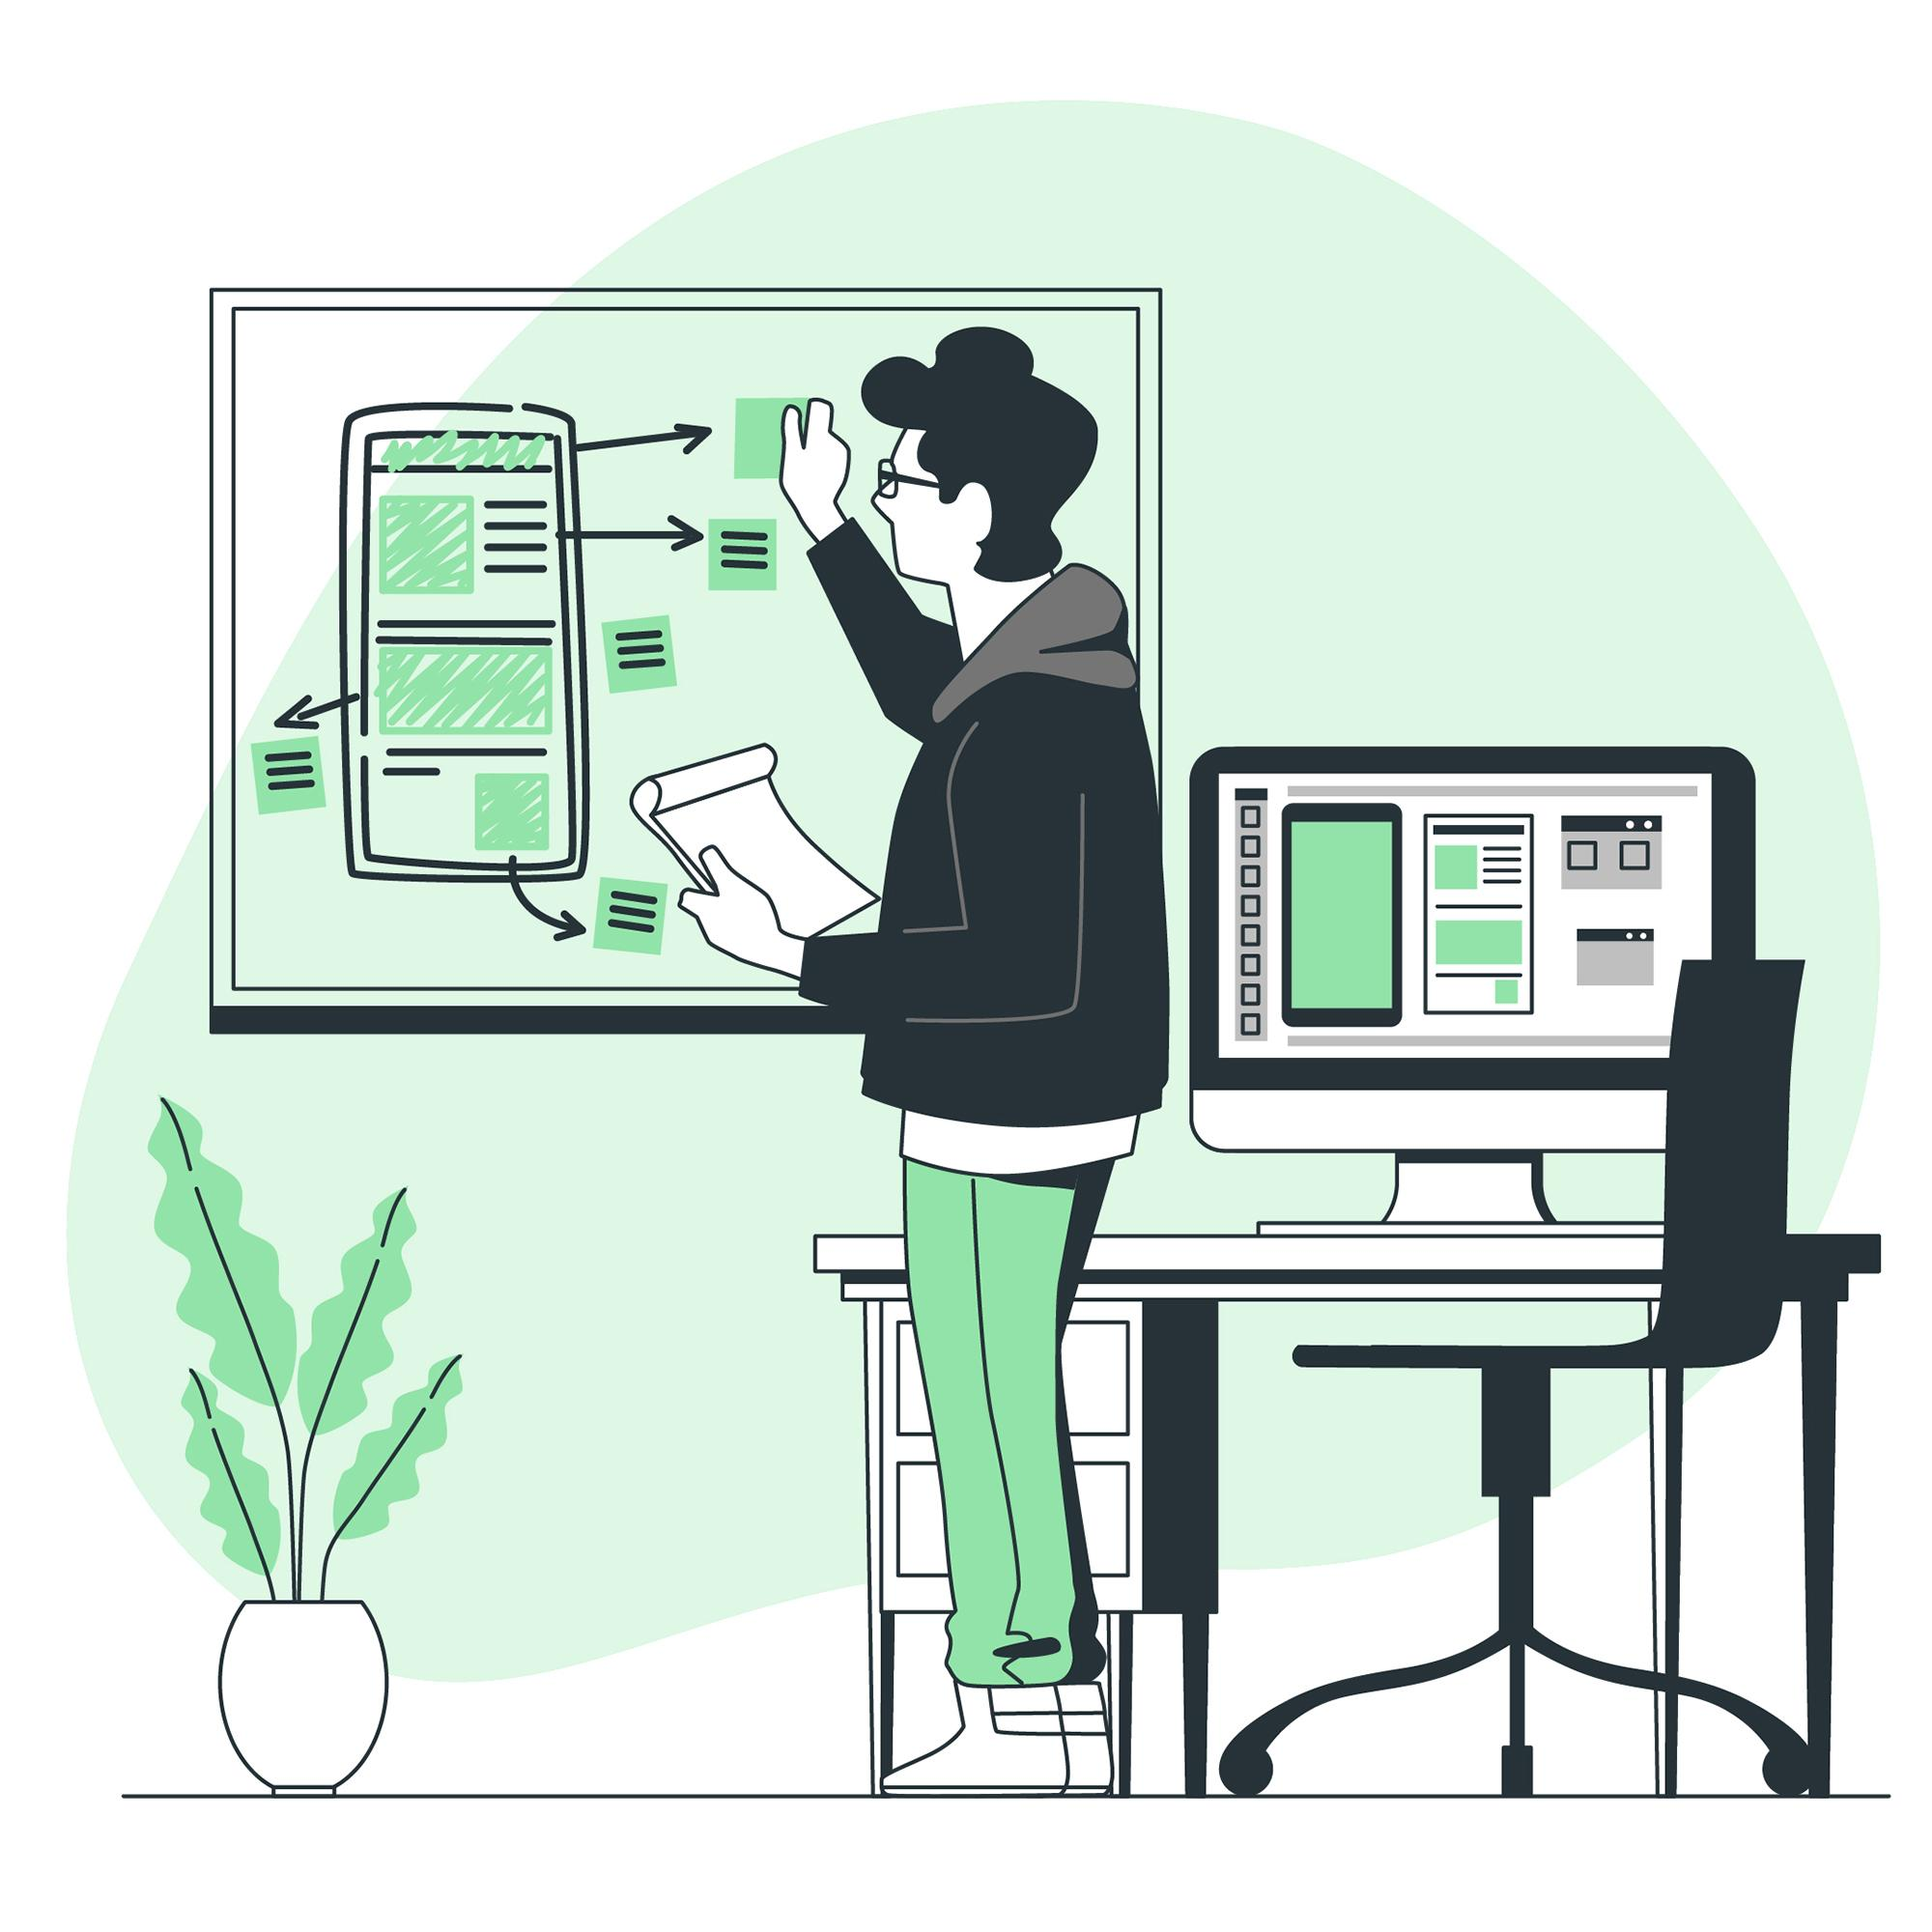 https://www.veribel.com.tr/wp-content/uploads/2021/01/product-development.jpg